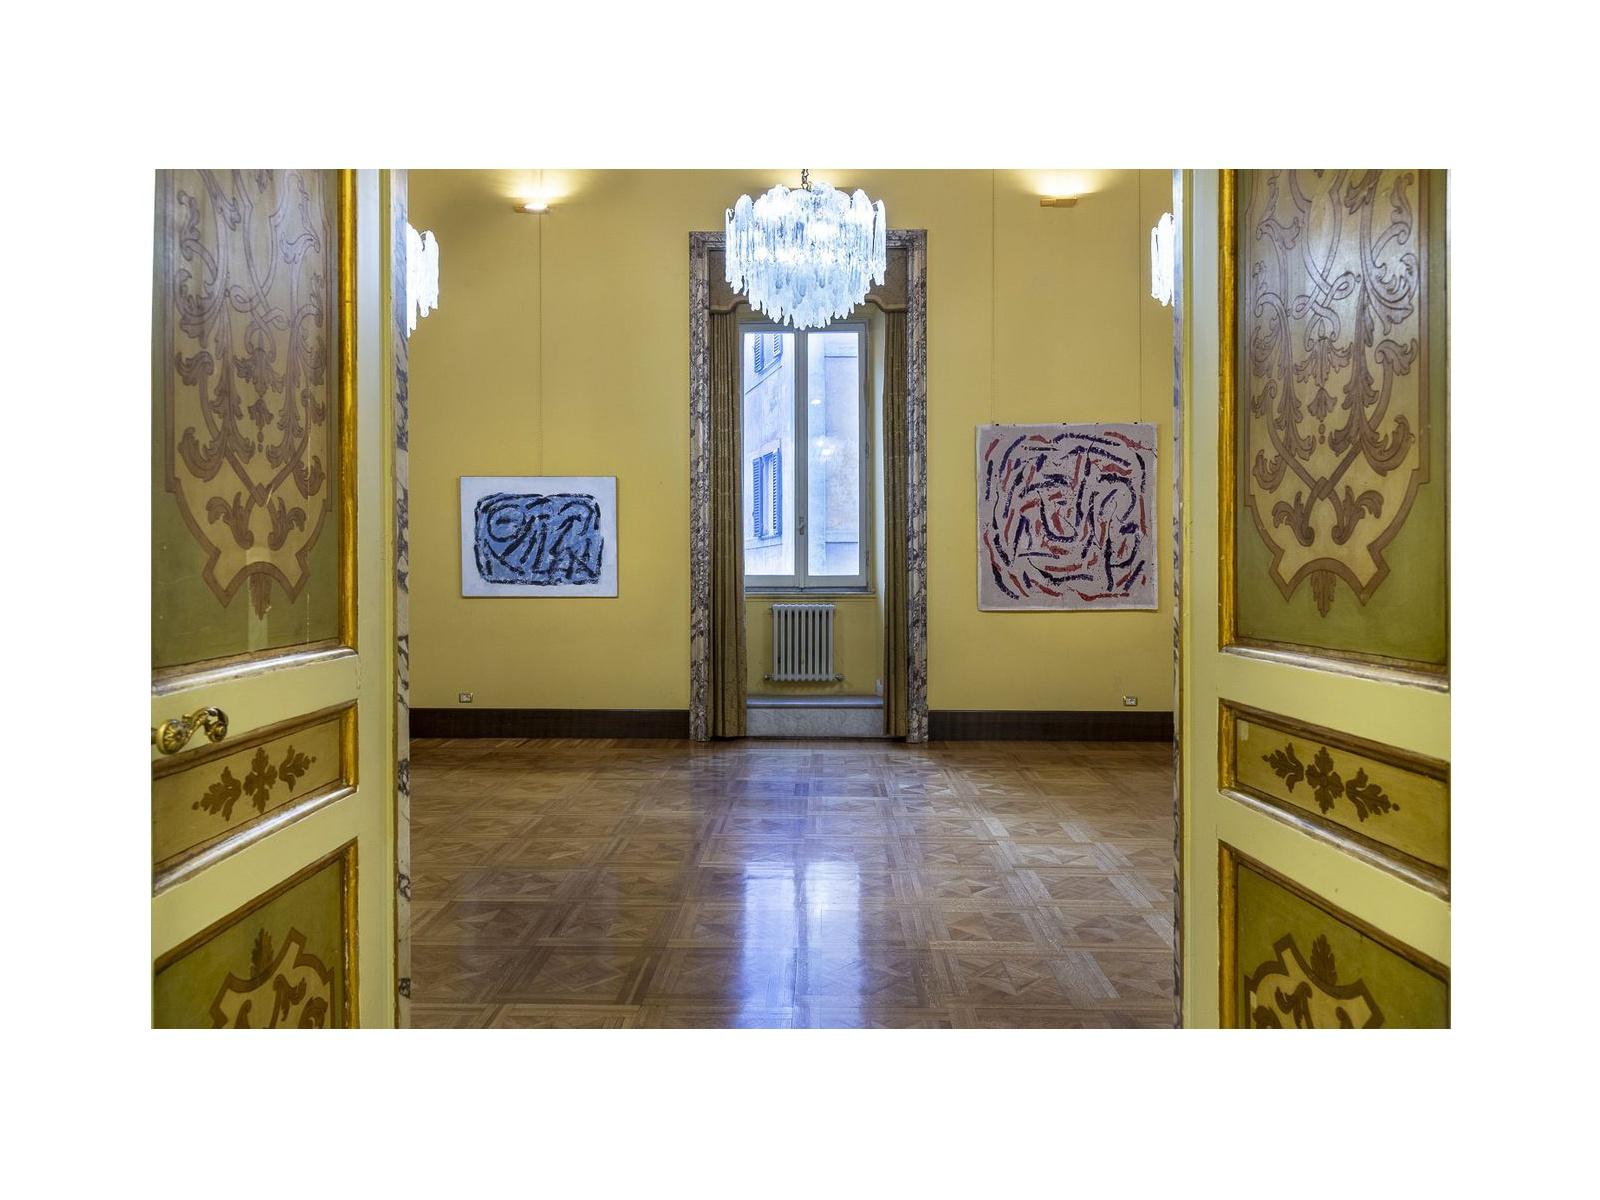 Karl-Stengel.-Con-cuore-puro.-Exhibition-view-at-Accademia-dUngheria-Roma-2020.-Photo-Klára-Várhelyi-_1_2